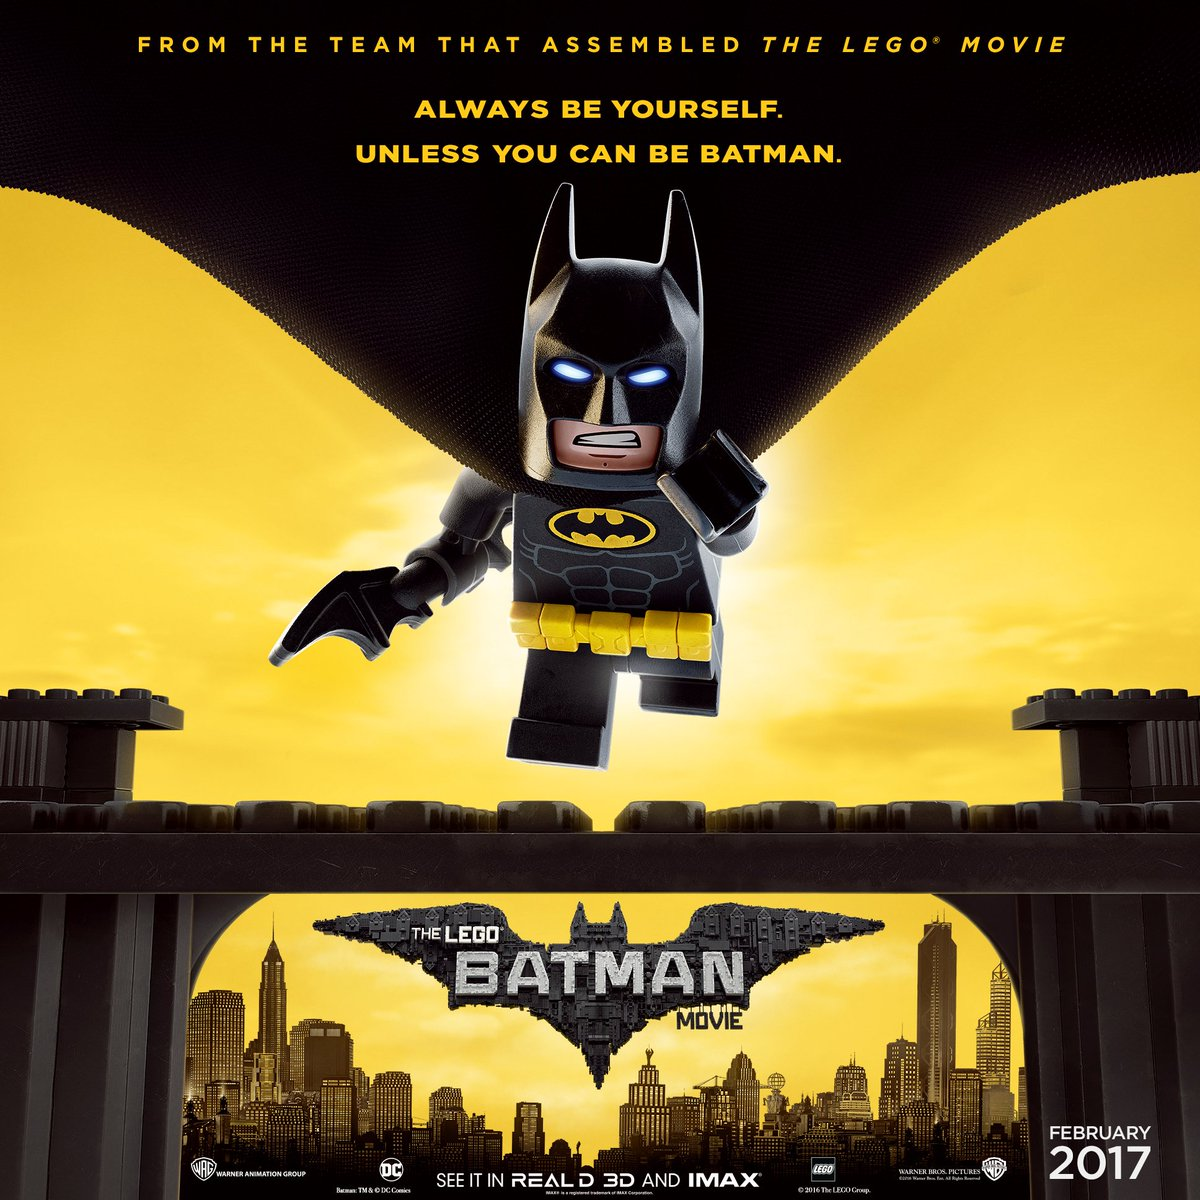 Feb 4: Movie Screening - The Lego Batman Movie